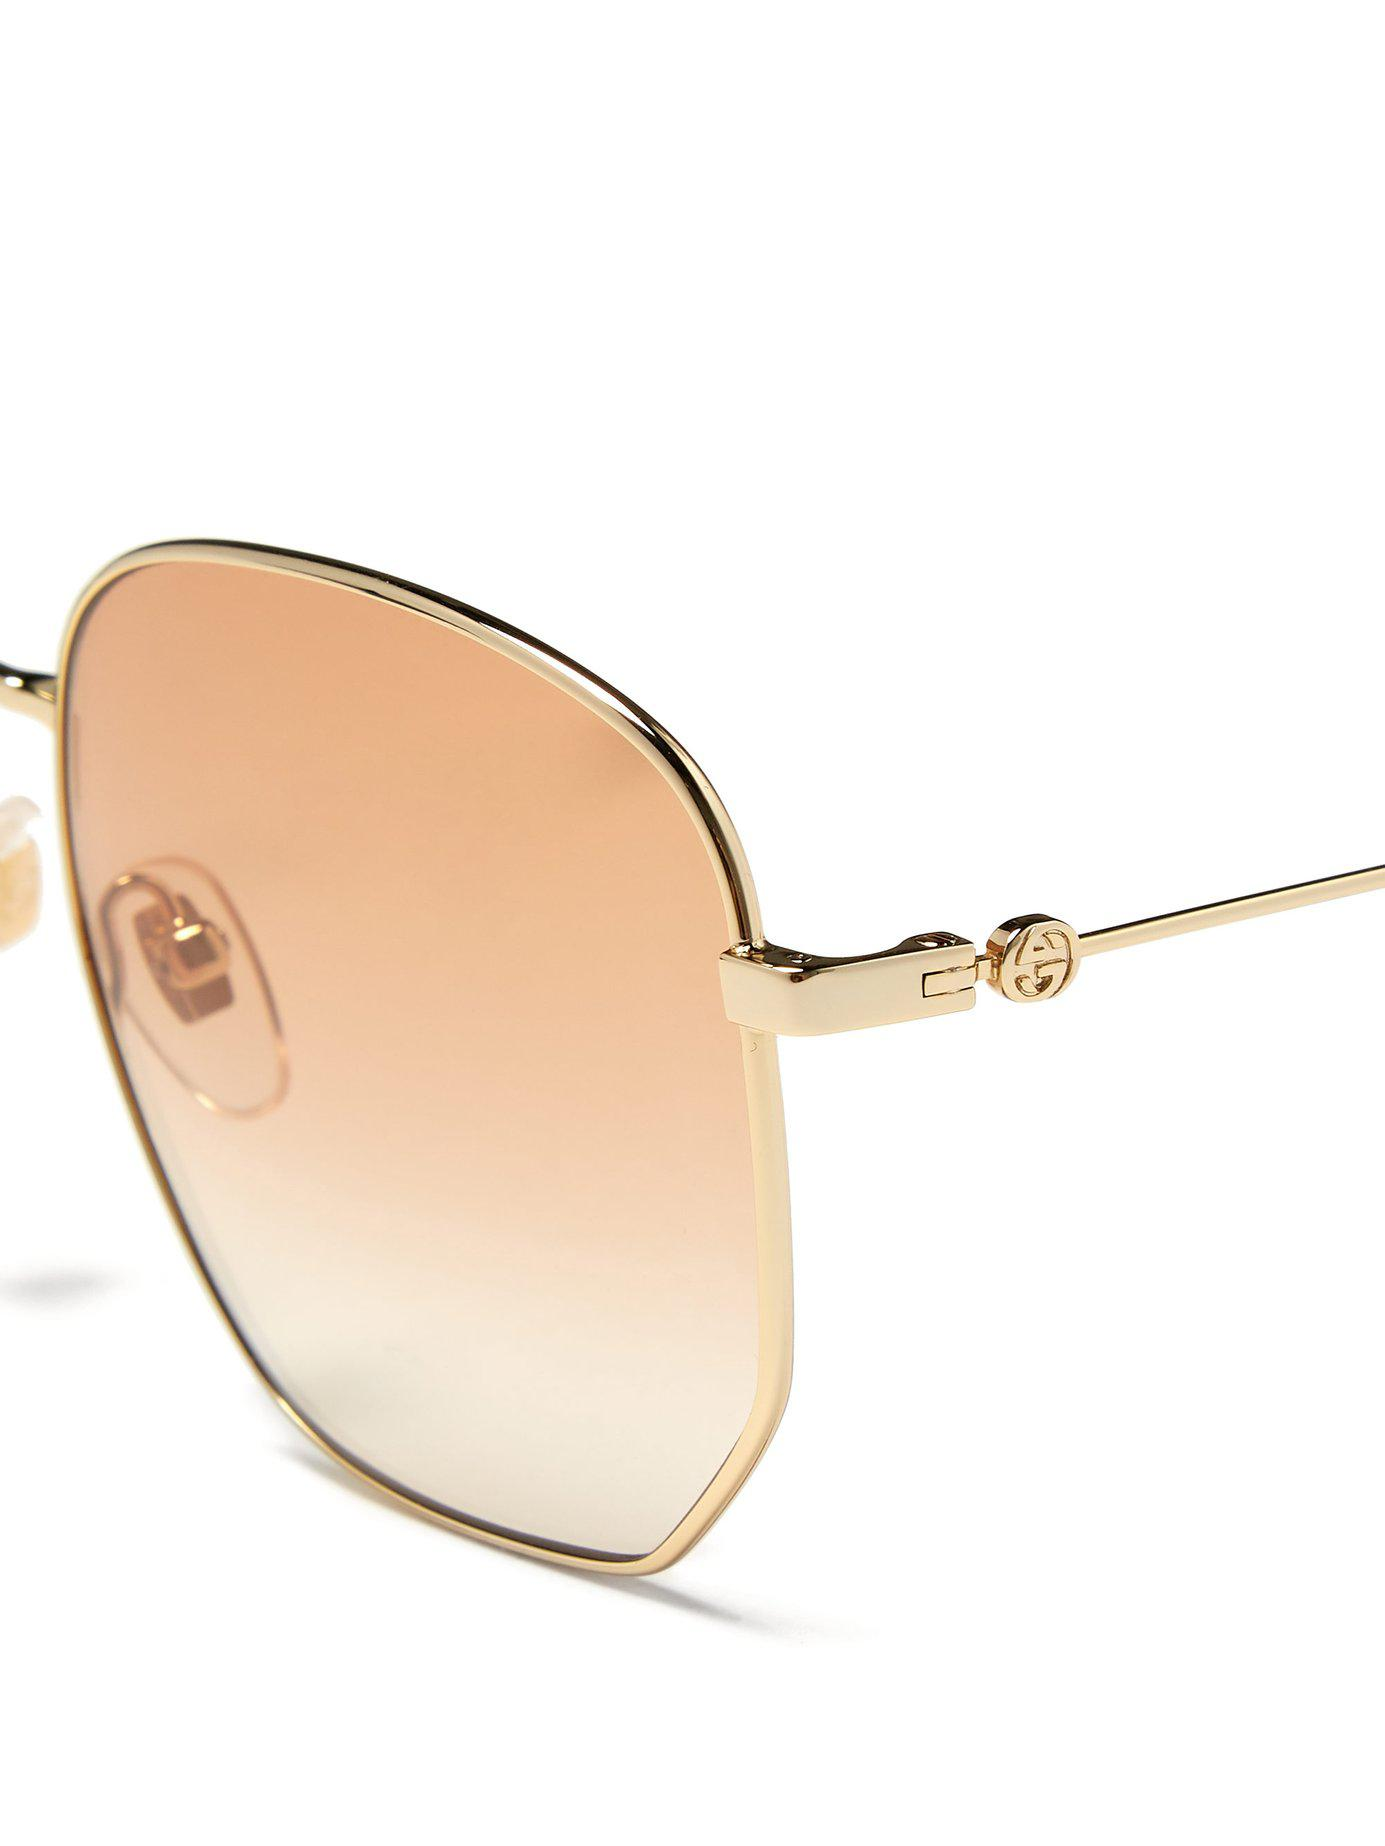 6864b4e1bda Gucci - Orange Oversized Bee Engraved Metal Sunglasses - Lyst. View  fullscreen